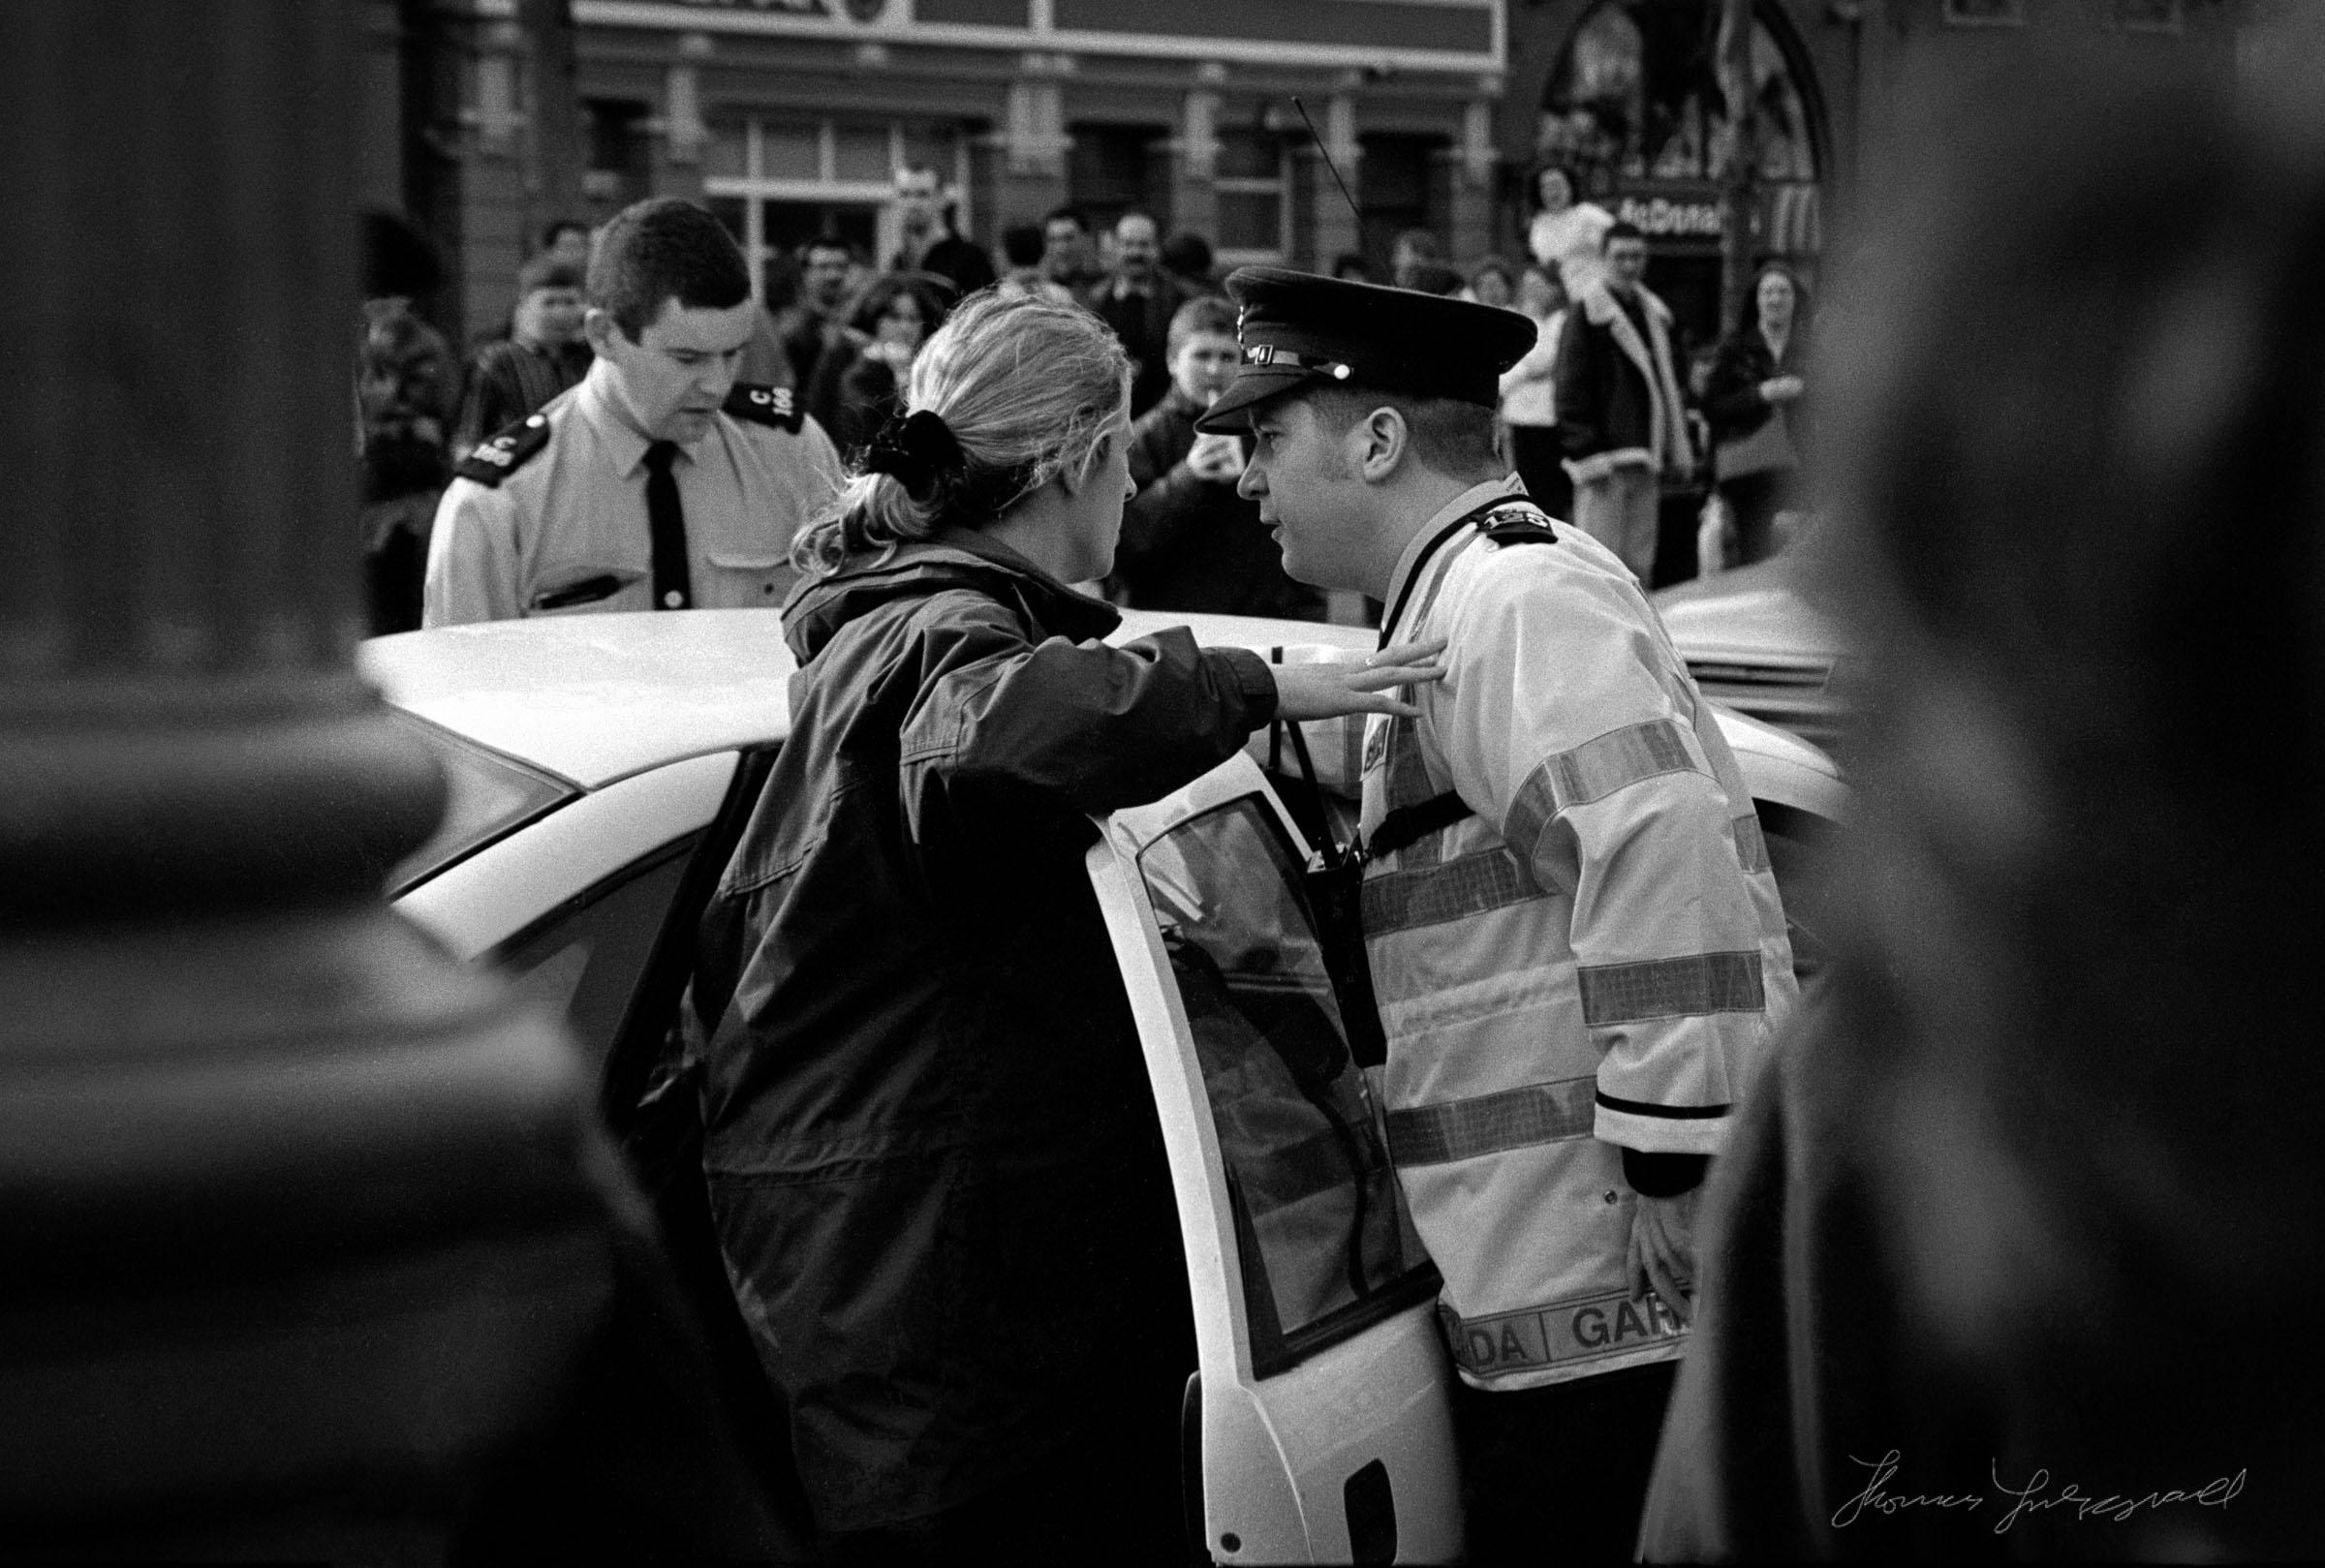 police-and-woman-1.jpg